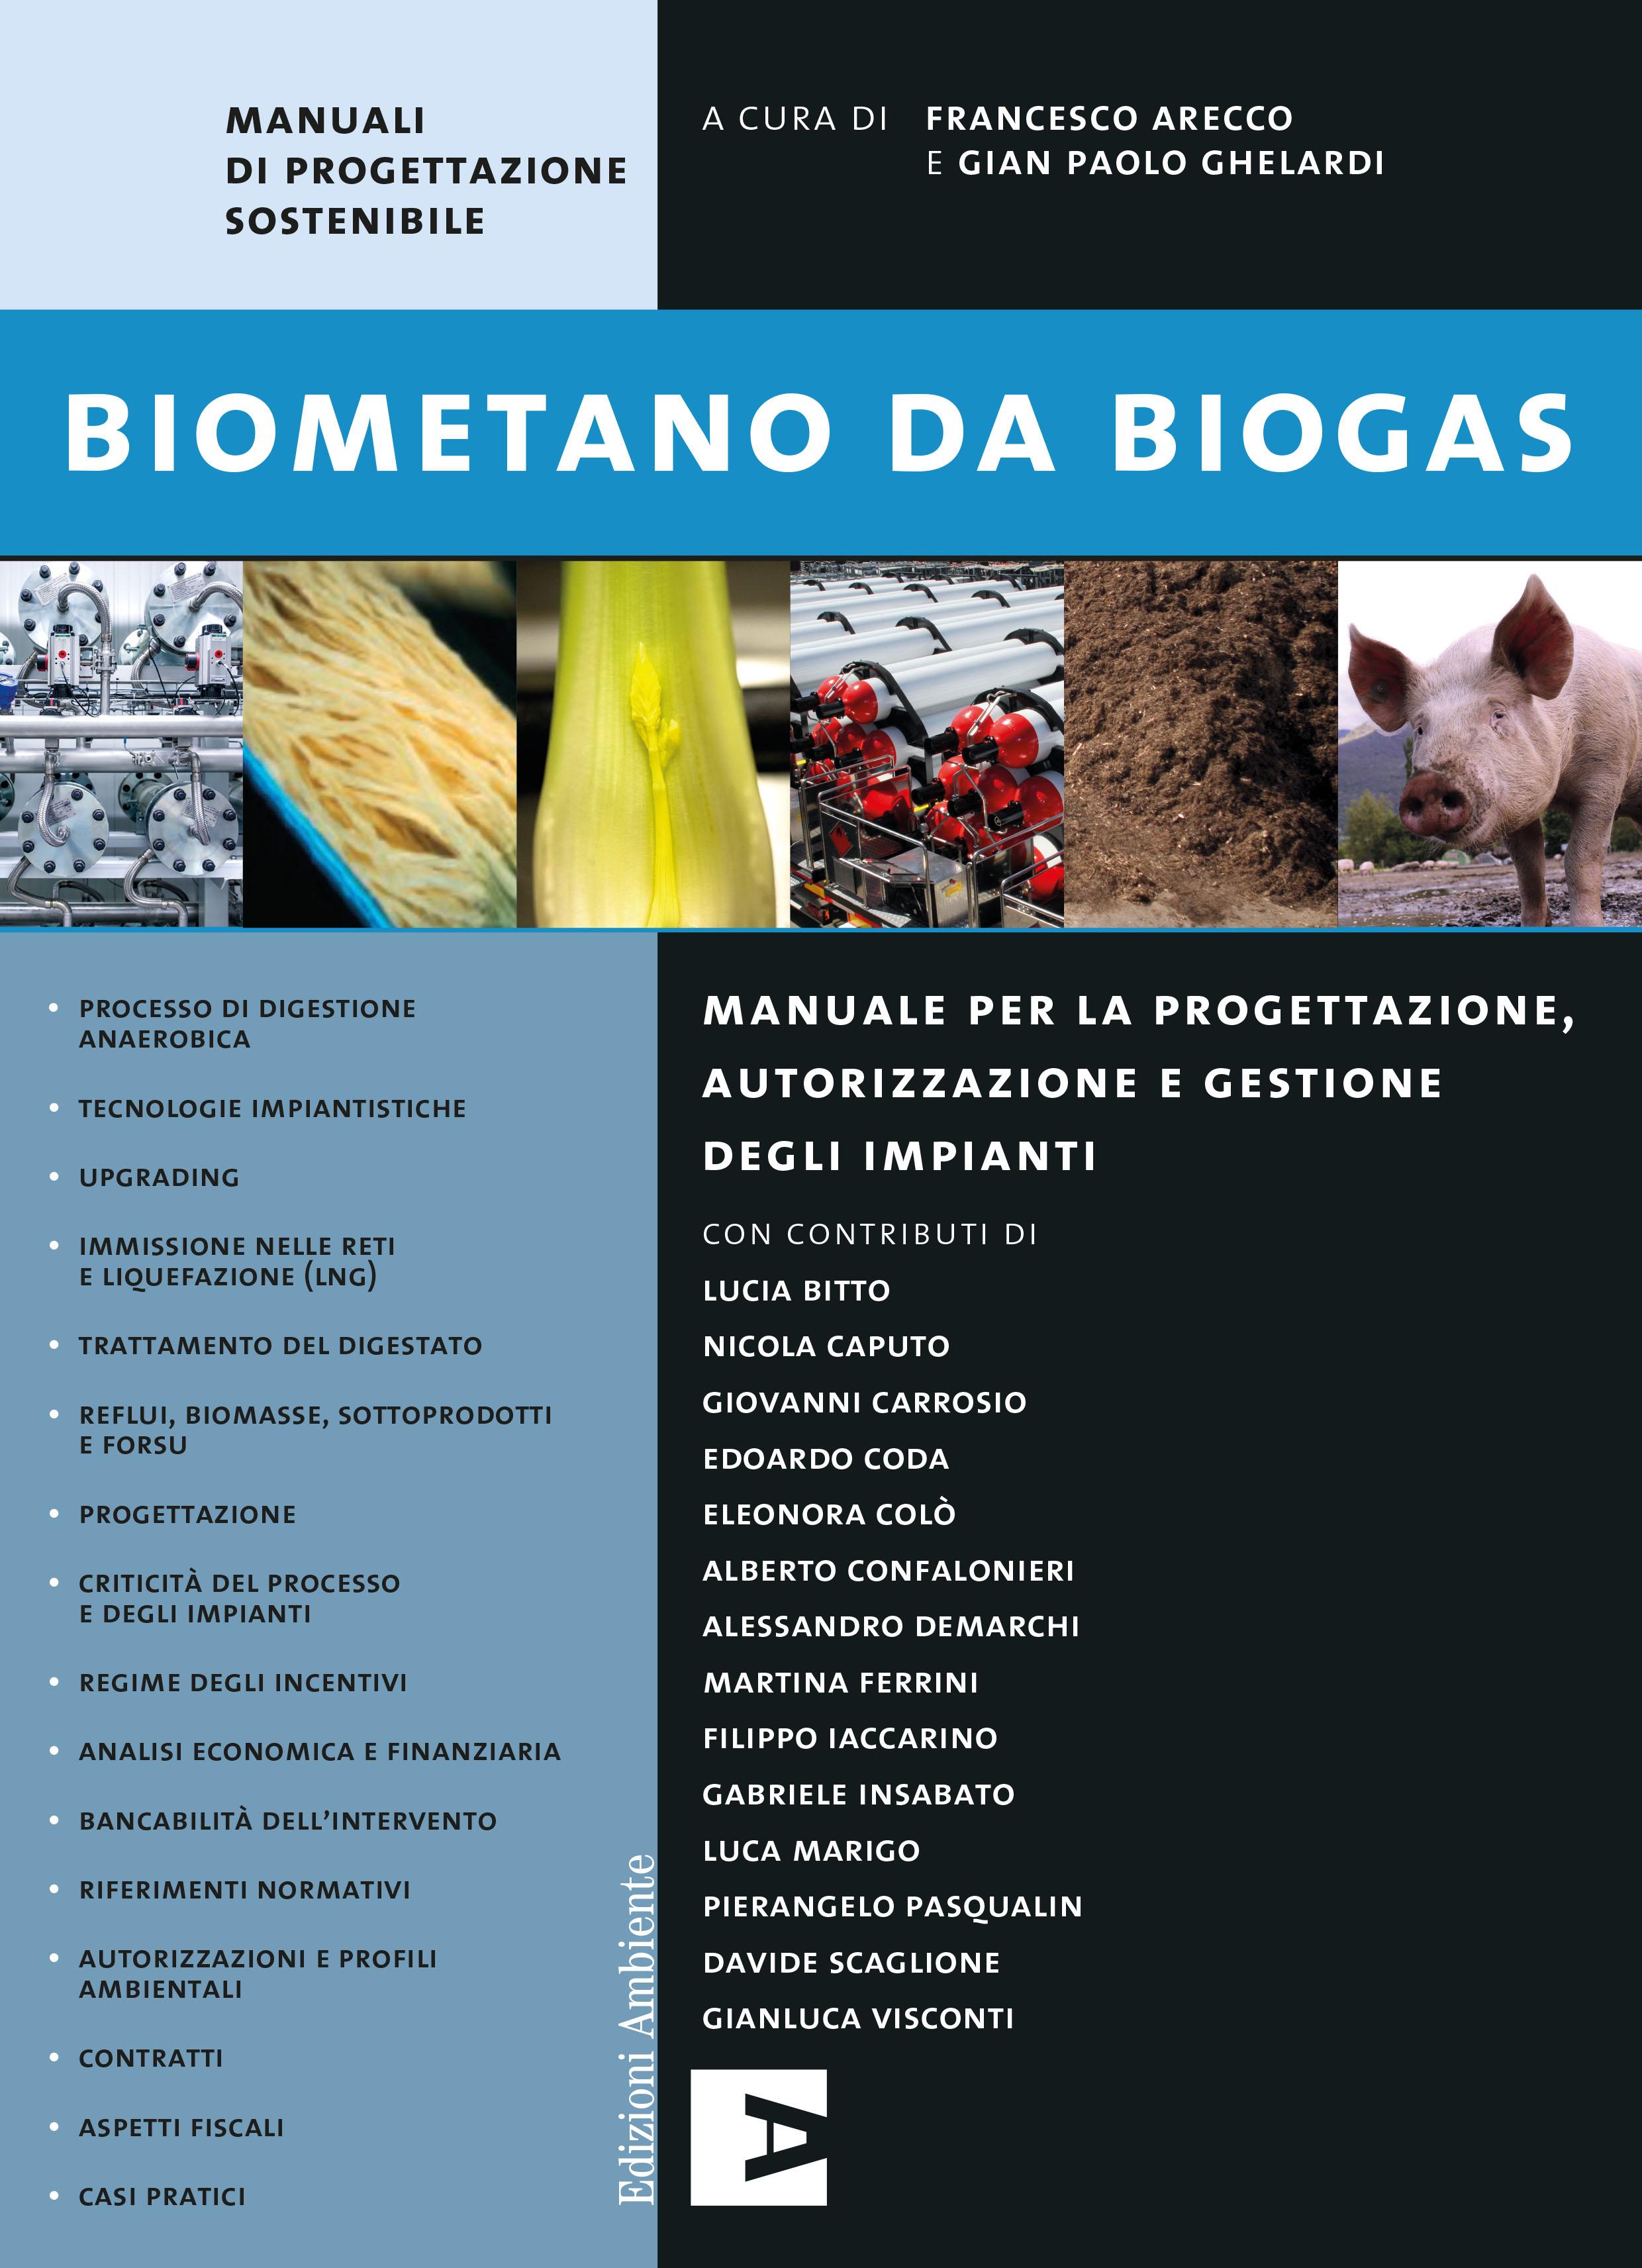 Biometano da biogas